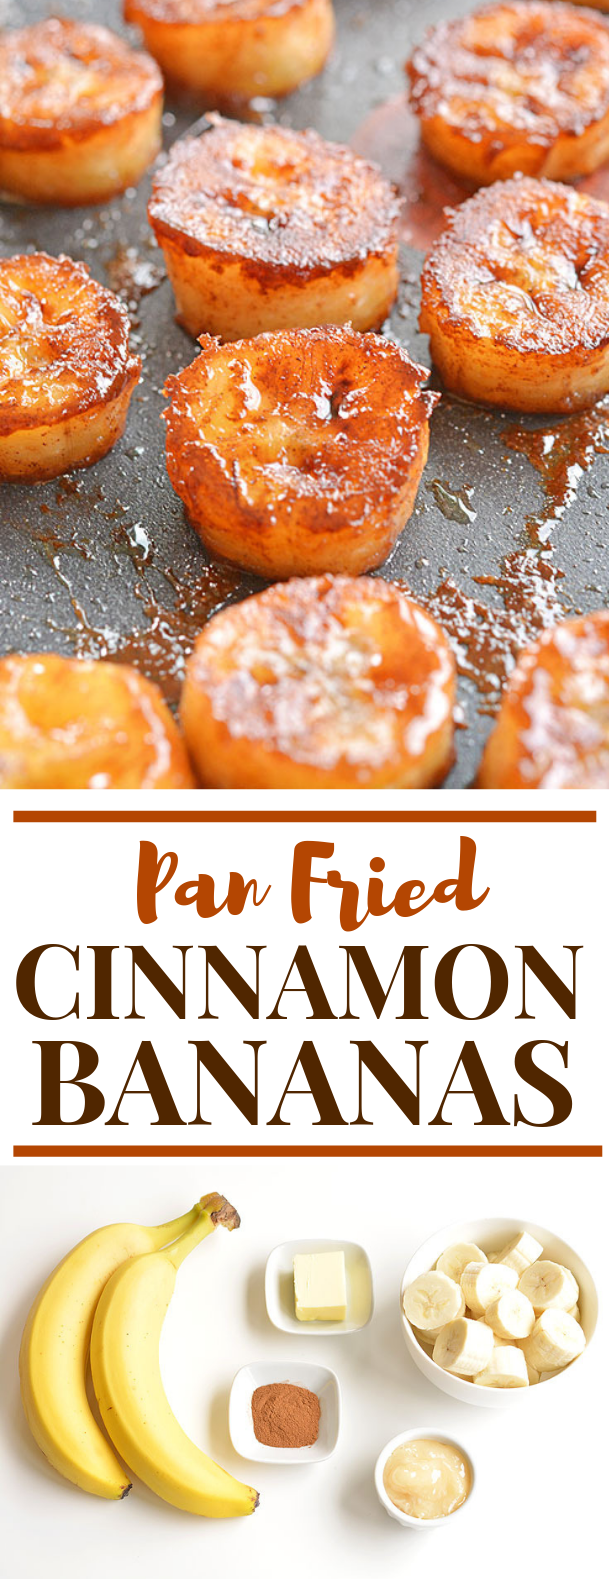 Pan Fried Cinnamon Bananas #paleo #vegetariandiet